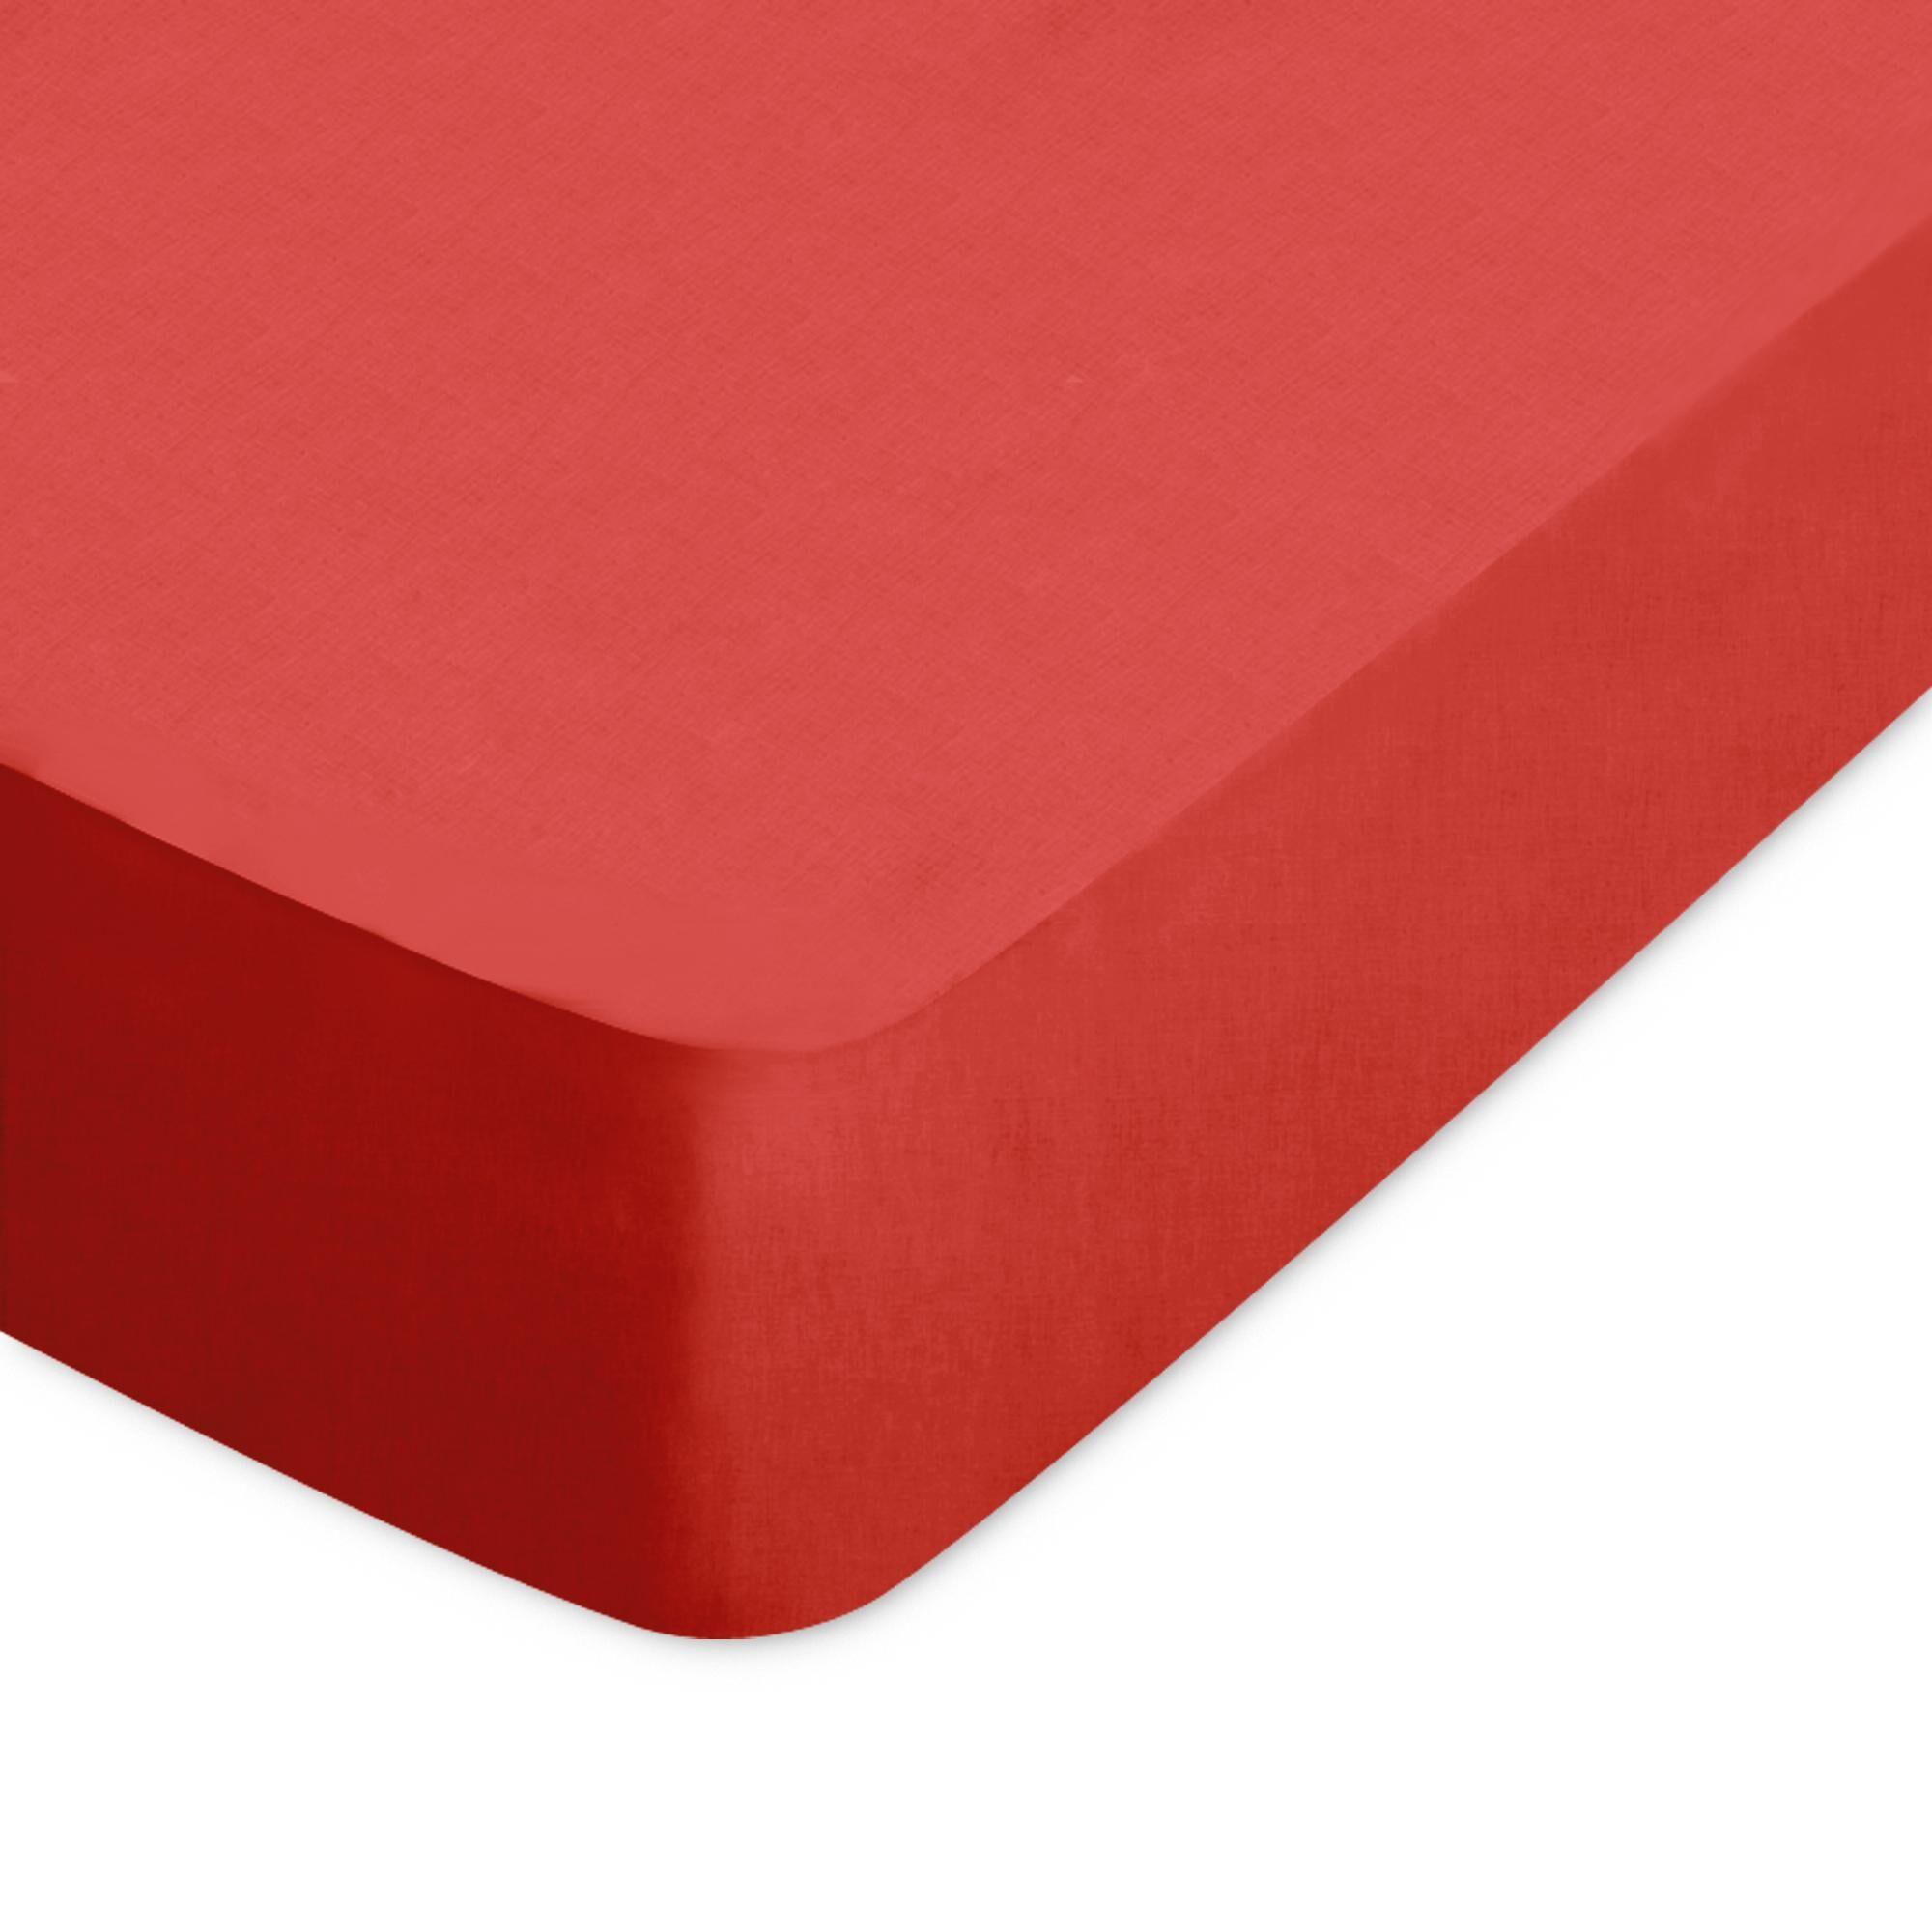 Linnea Drap housse uni 200x190 cm 100% coton ALTO orange Baie de Goji